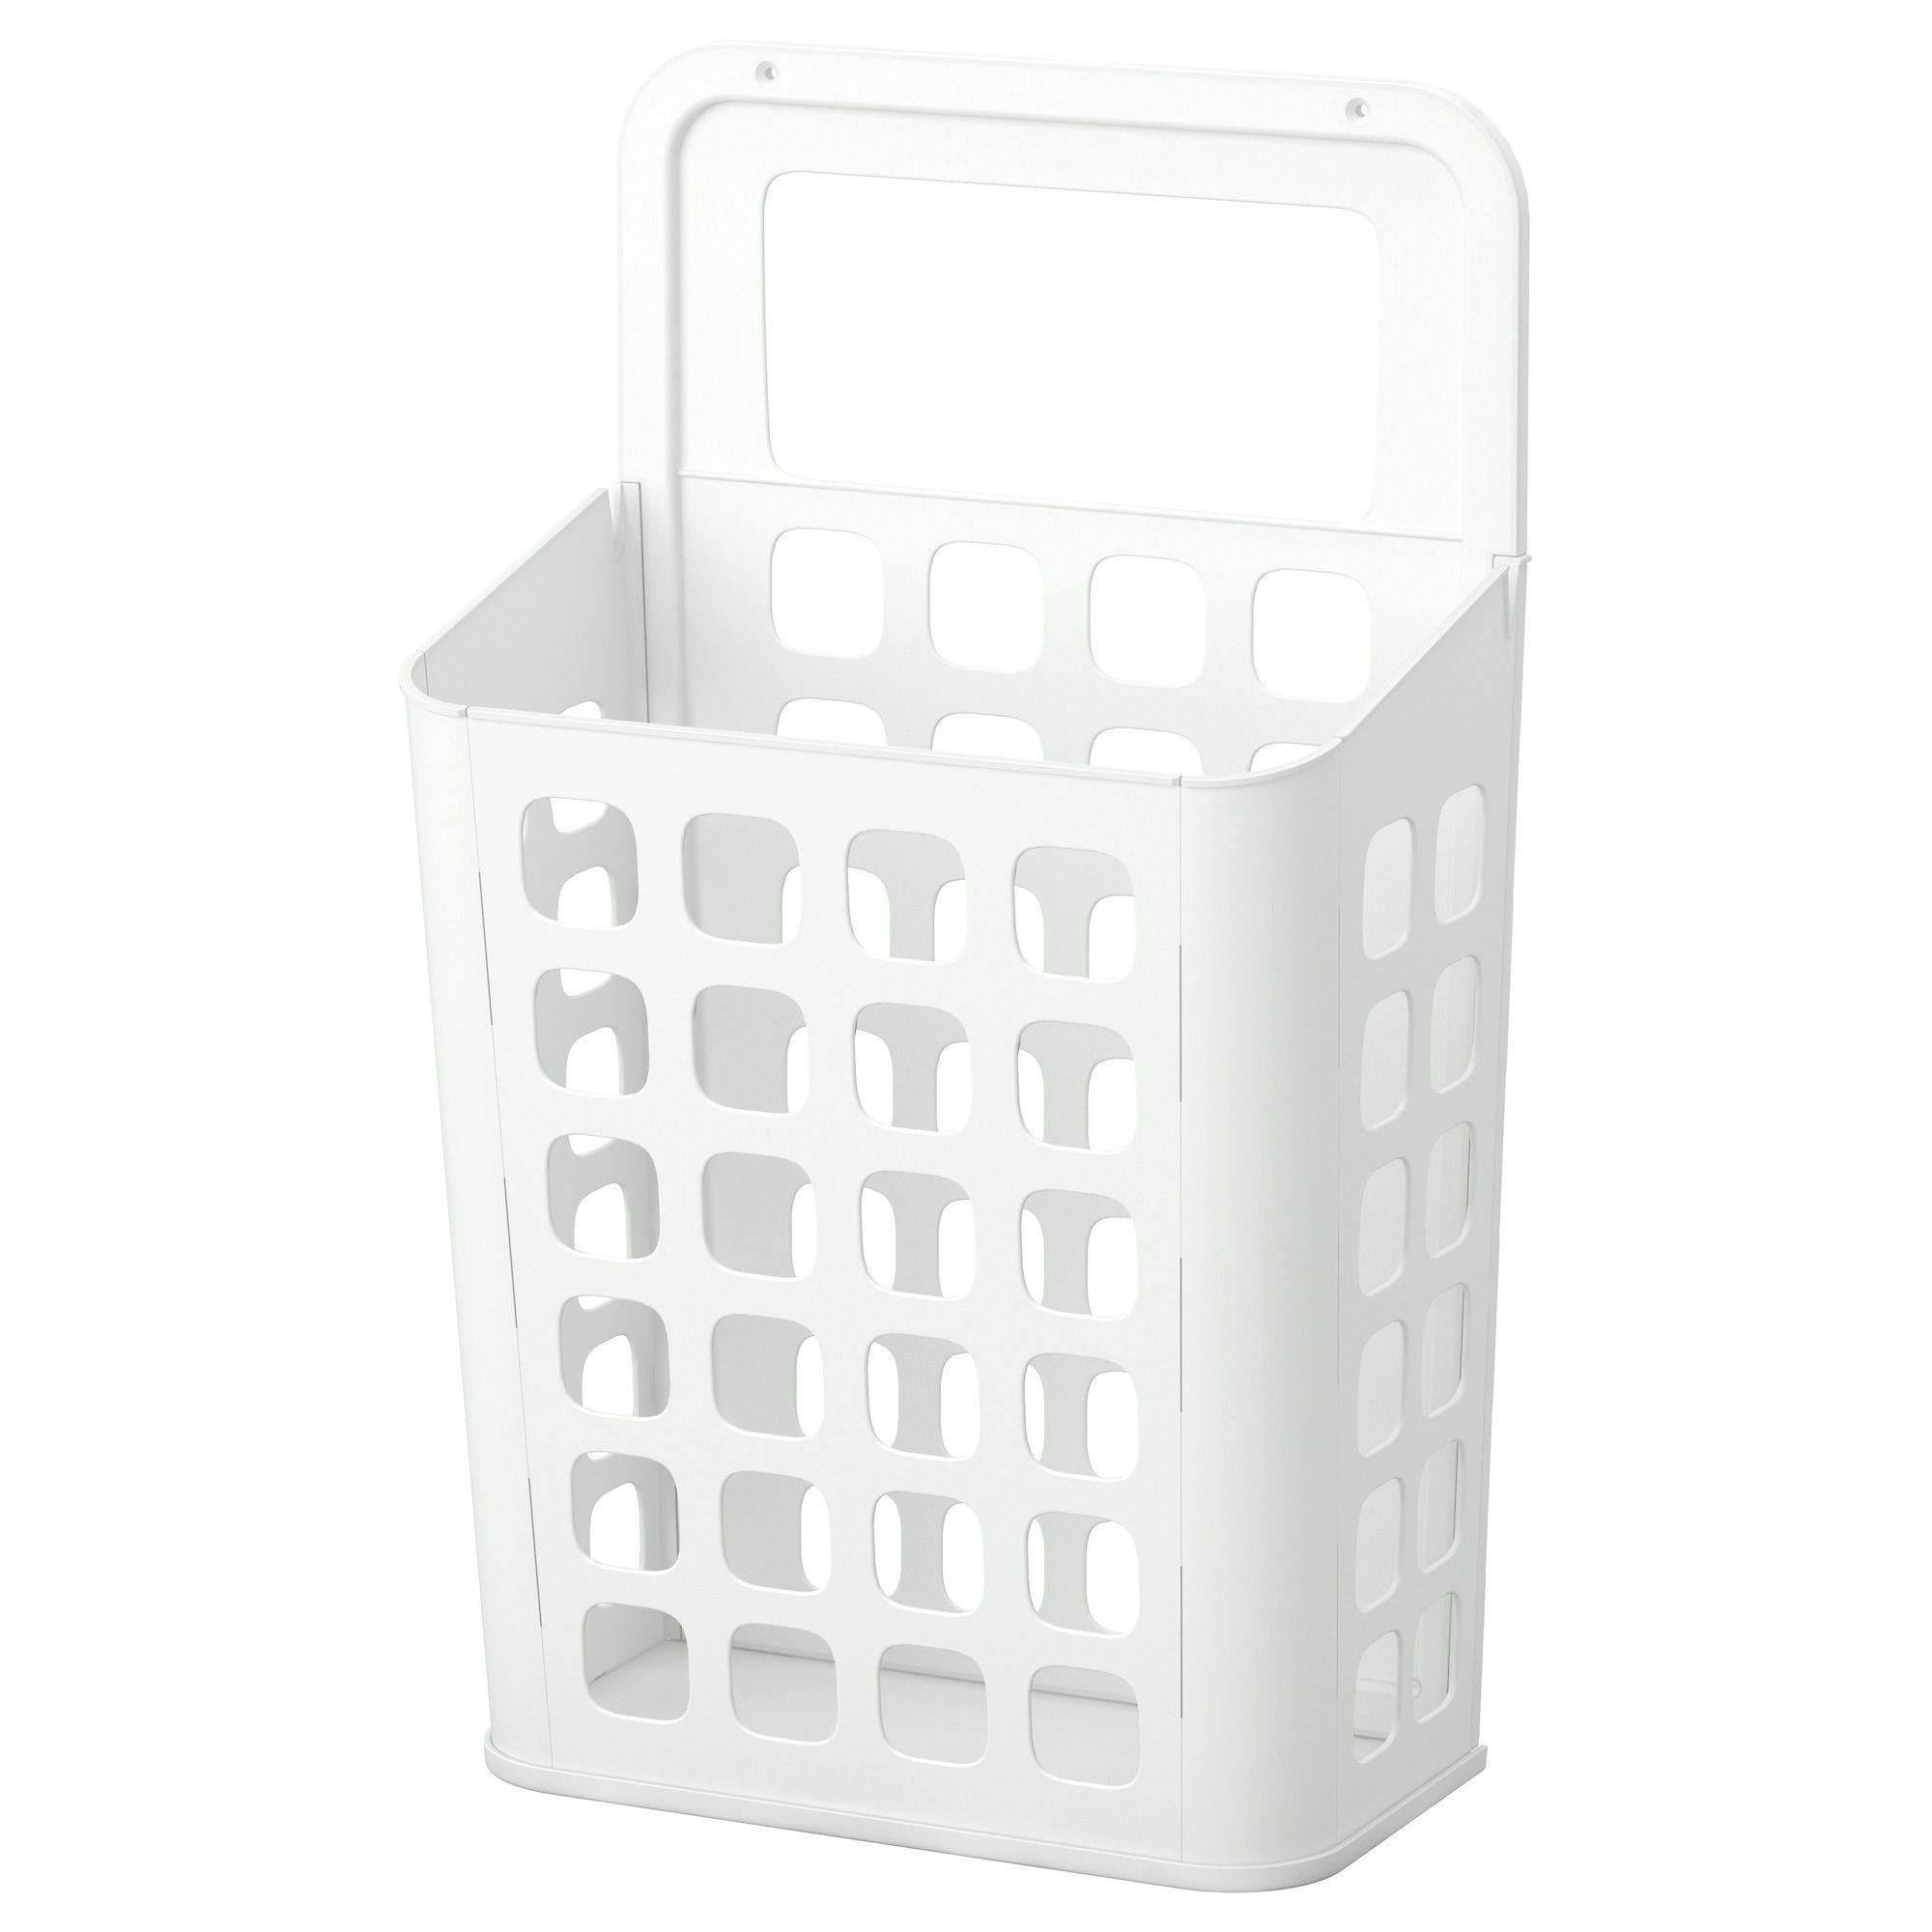 IKEA VARIERA Trash can white Ikea, Ikea kitchen, Ikea